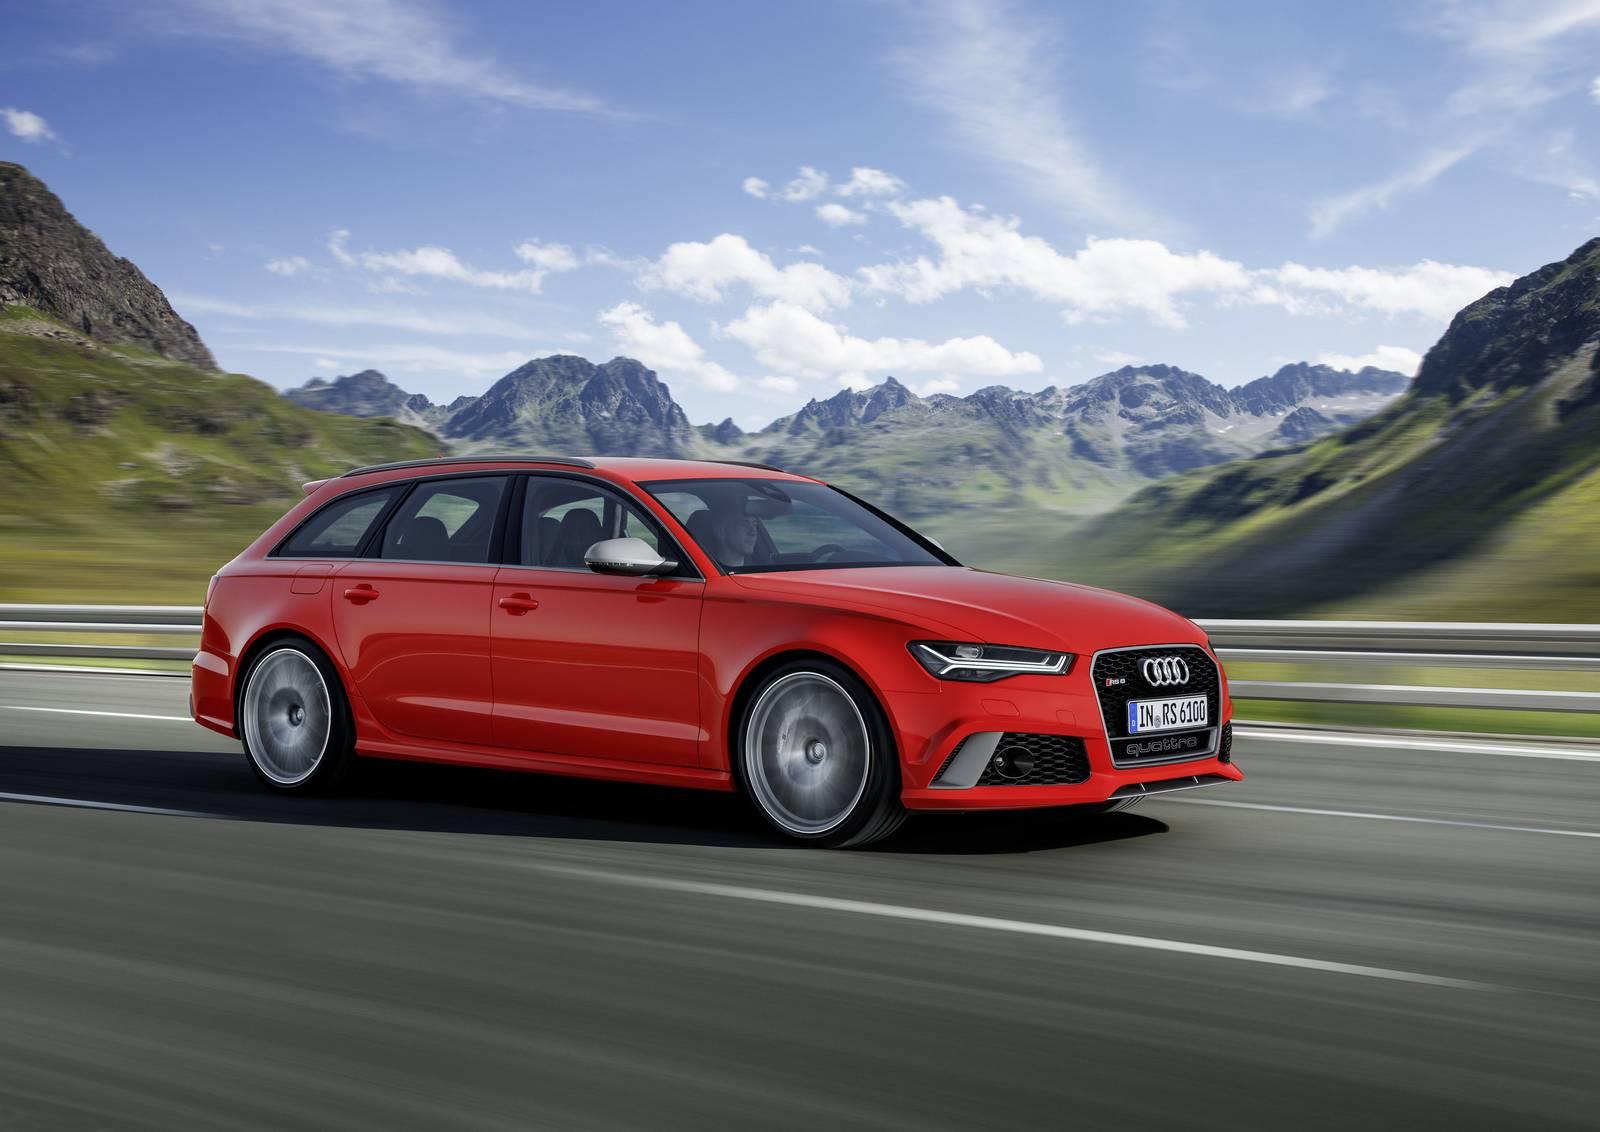 Official Audi RS And RS Performance Models GTspirit - Audi car models 2016